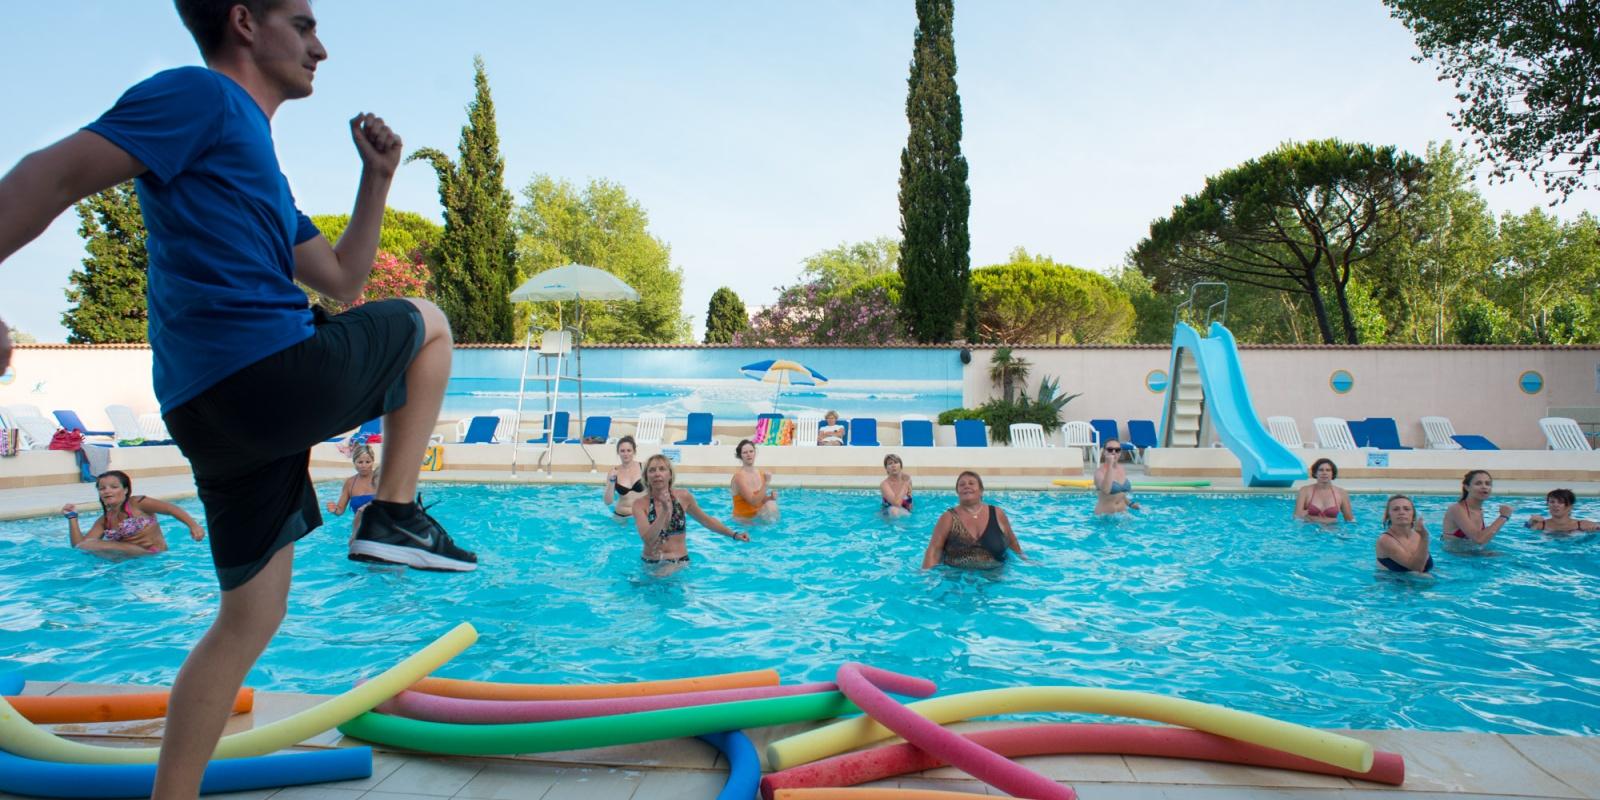 Piscine d 39 t piscine couverte camping au grau du roi for Piscine blomet aquagym